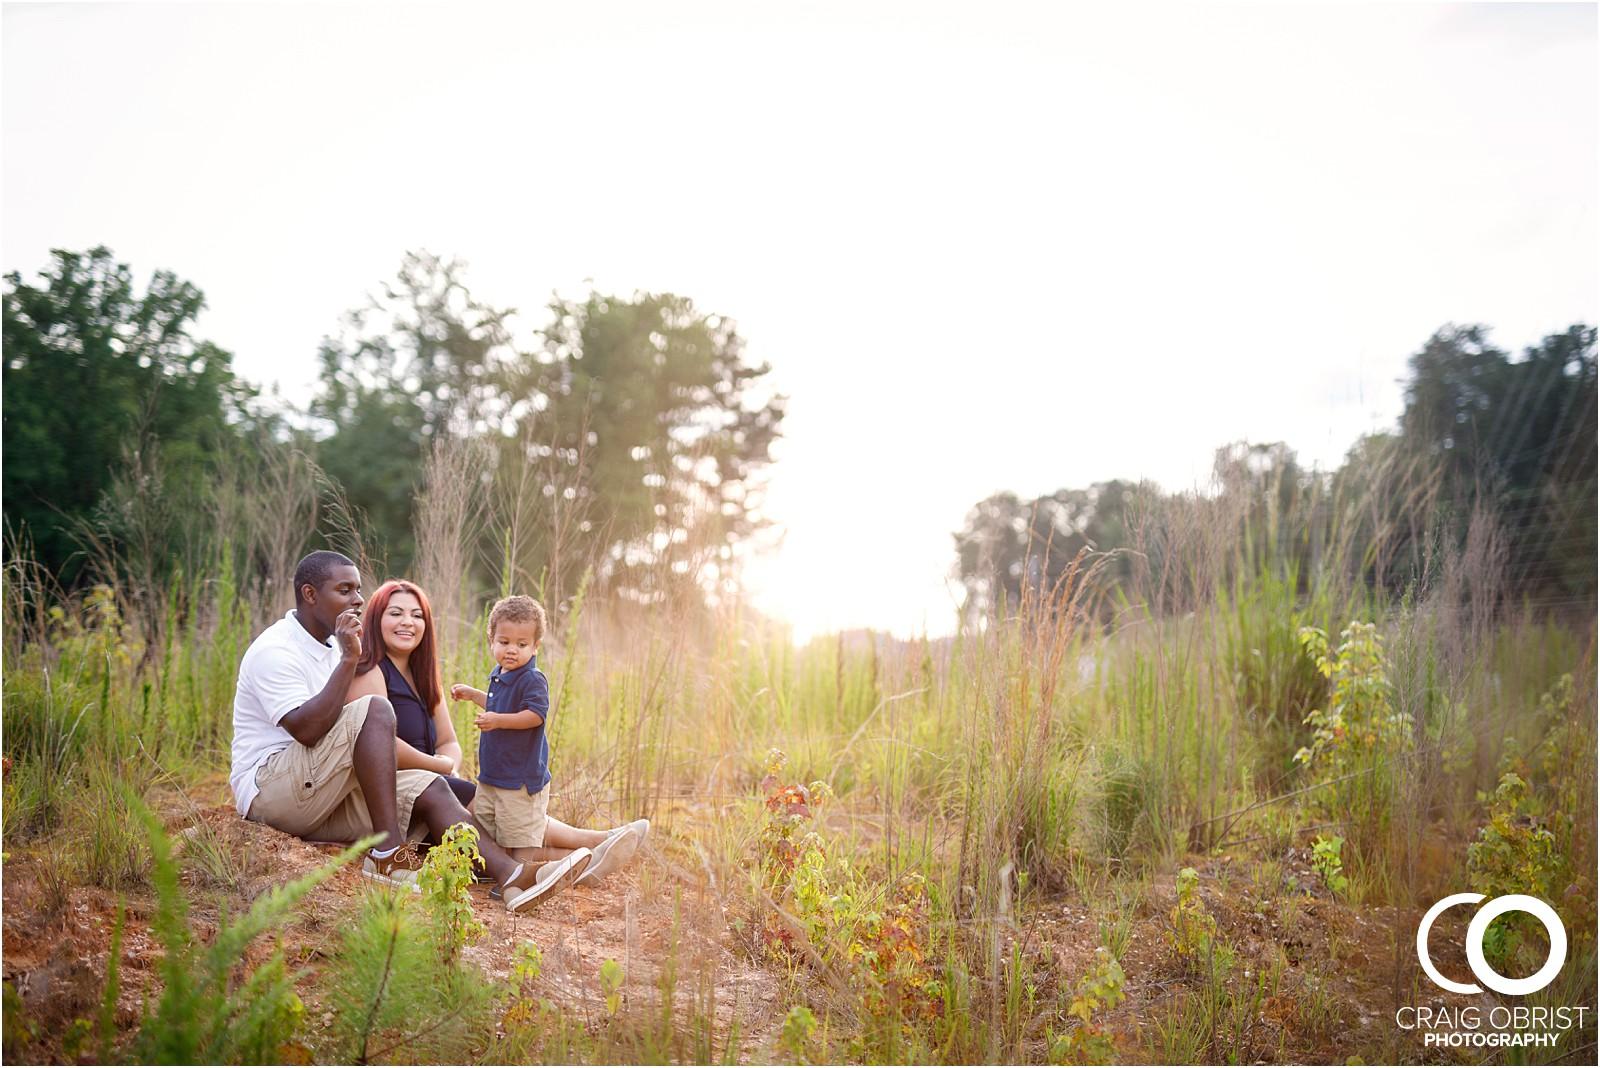 Grass Field Family Portratis Sunset Atlanta_0025.jpg